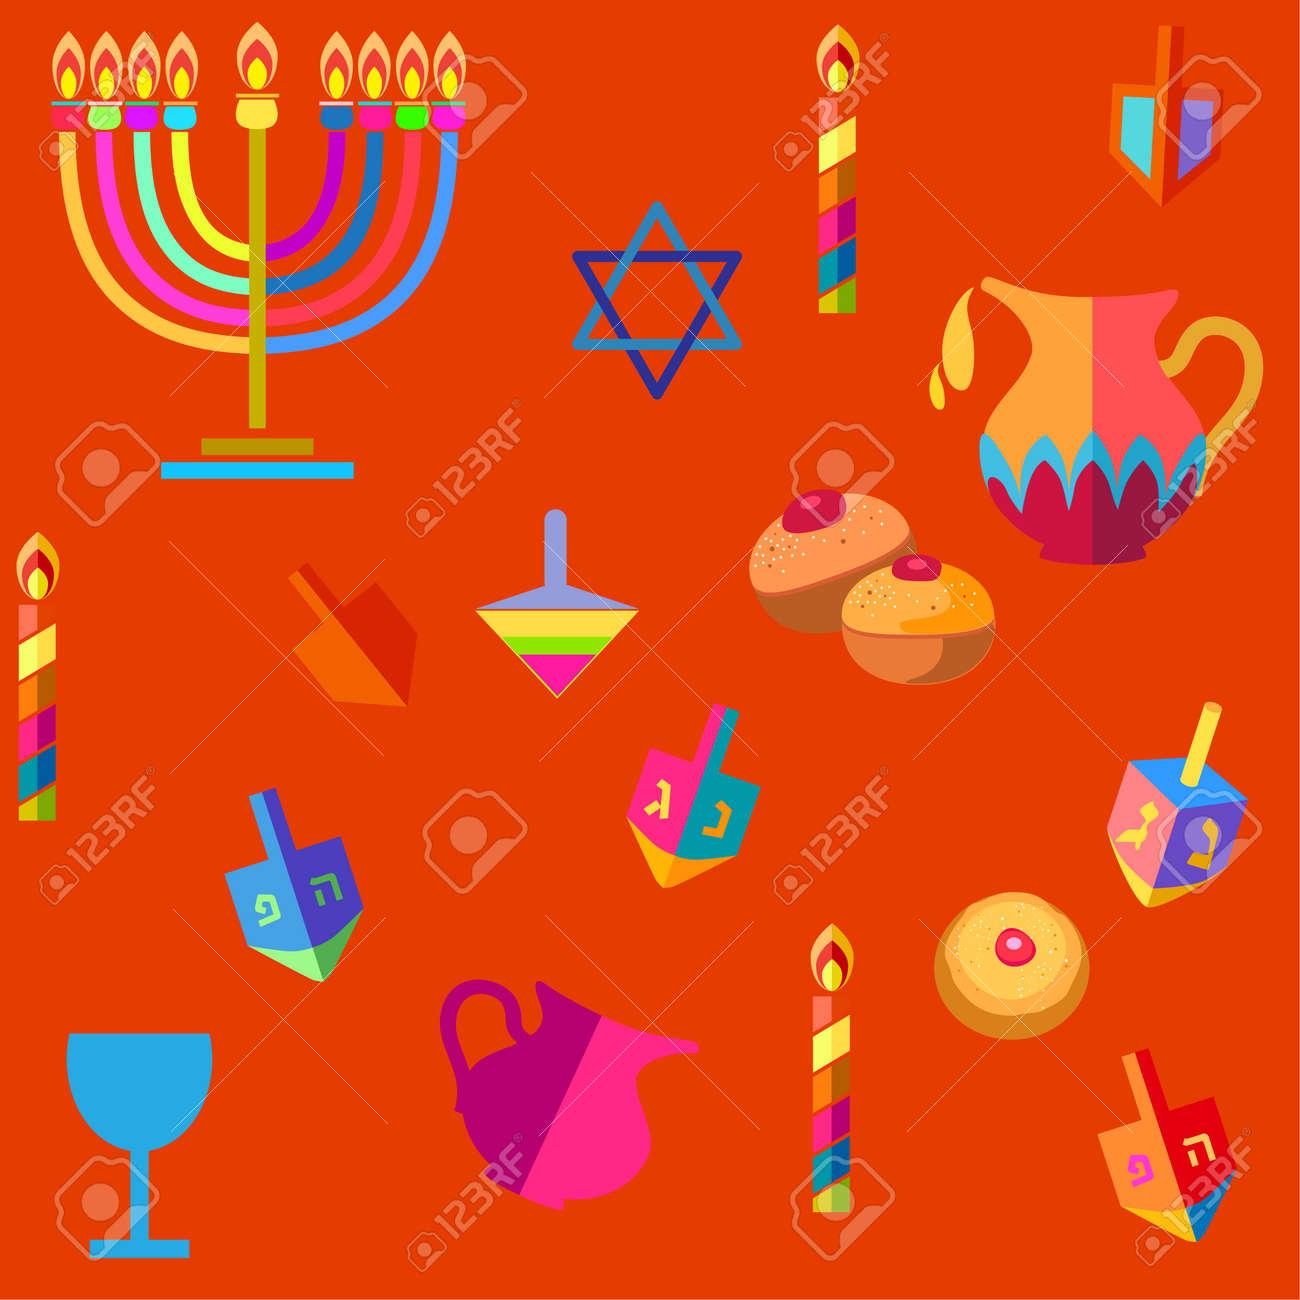 Jewish Holiday Hanukkah Seamless Pattern With Traditional Chanukah